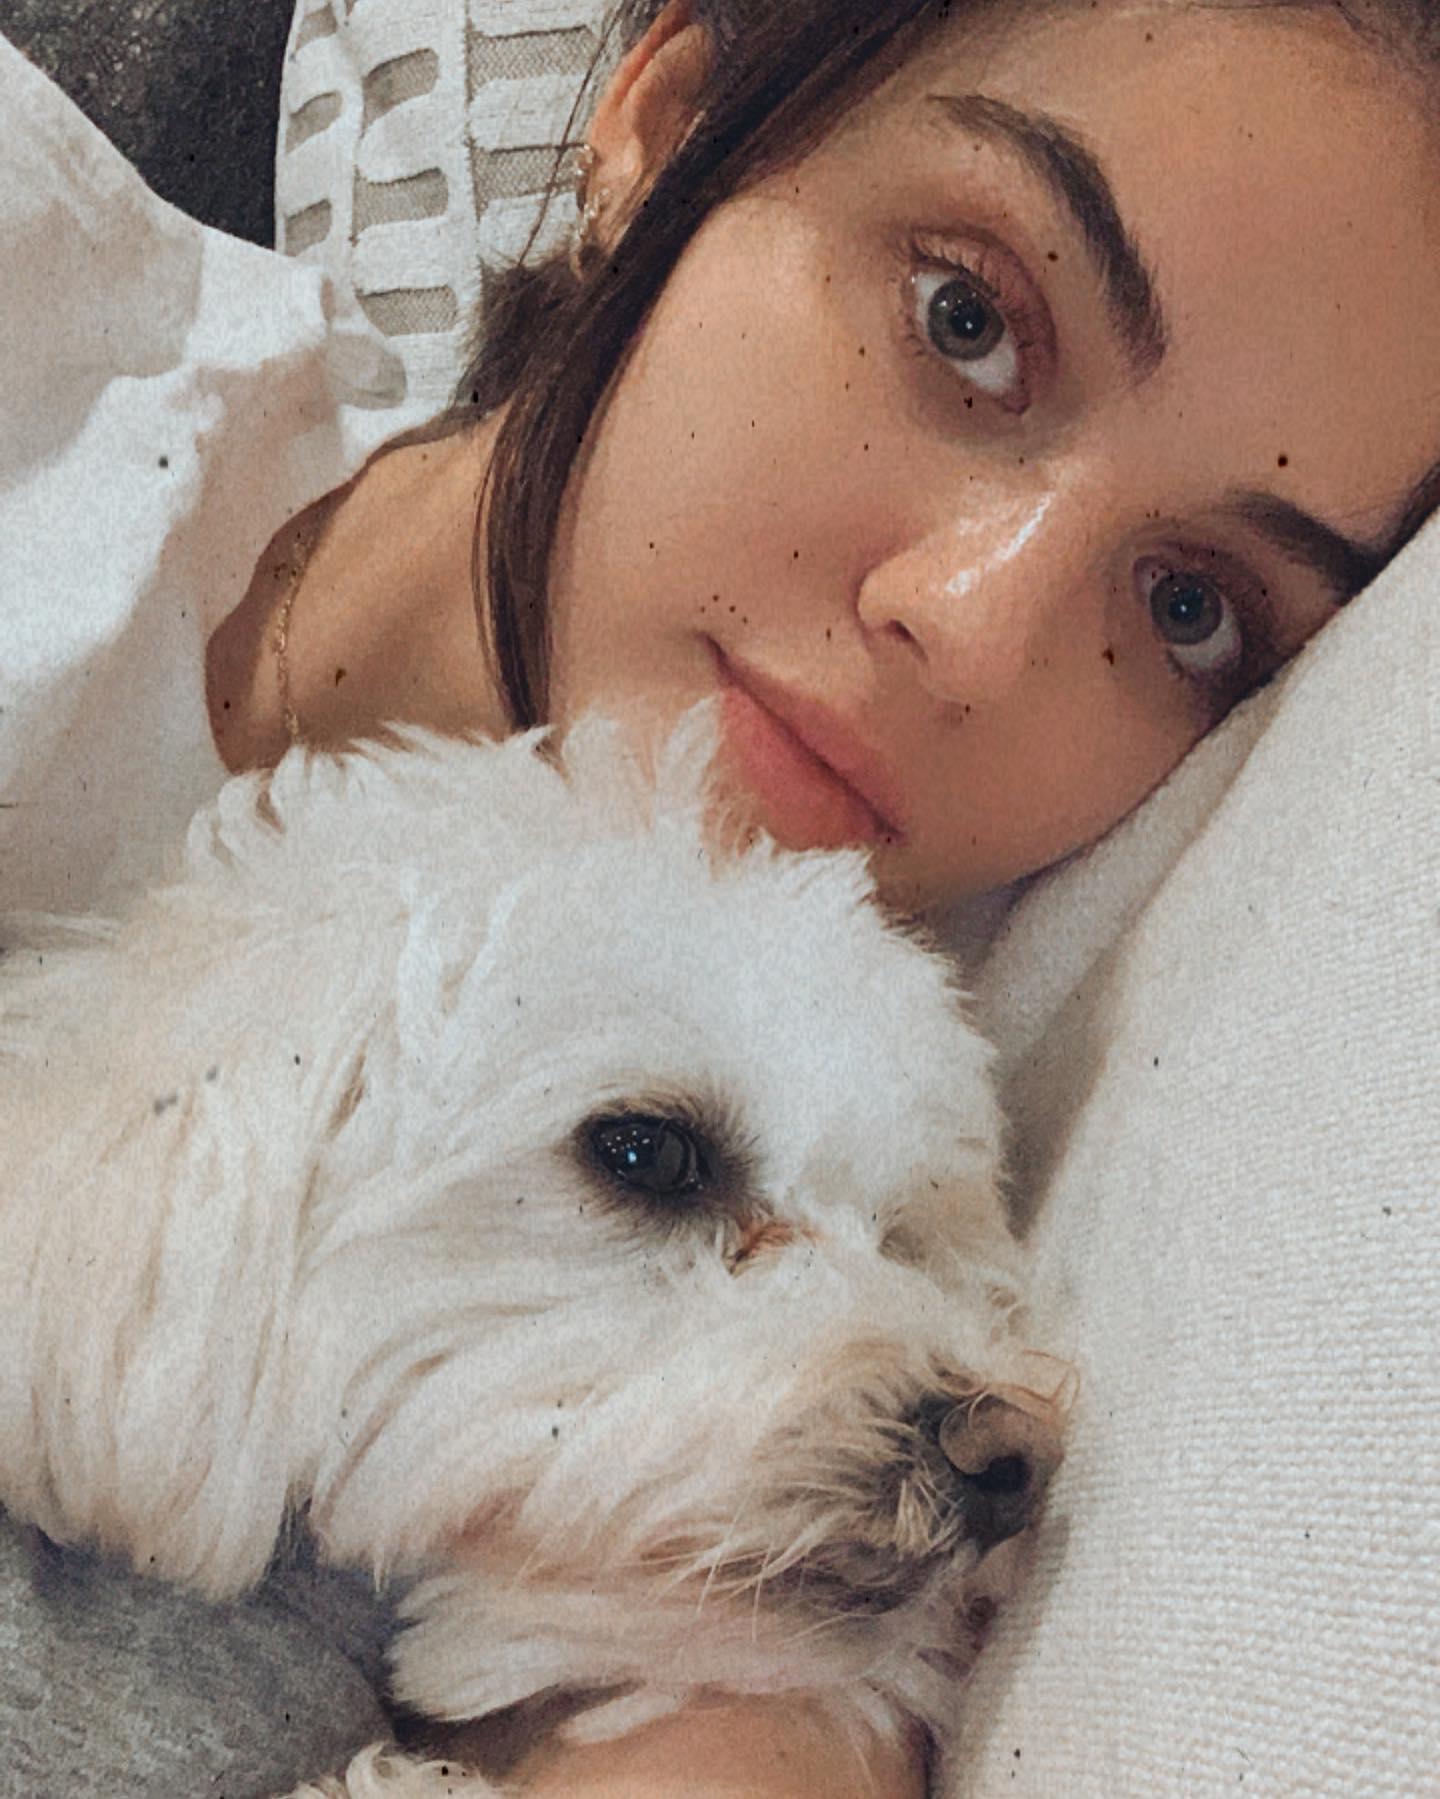 Lucy Hale - Social medis photos